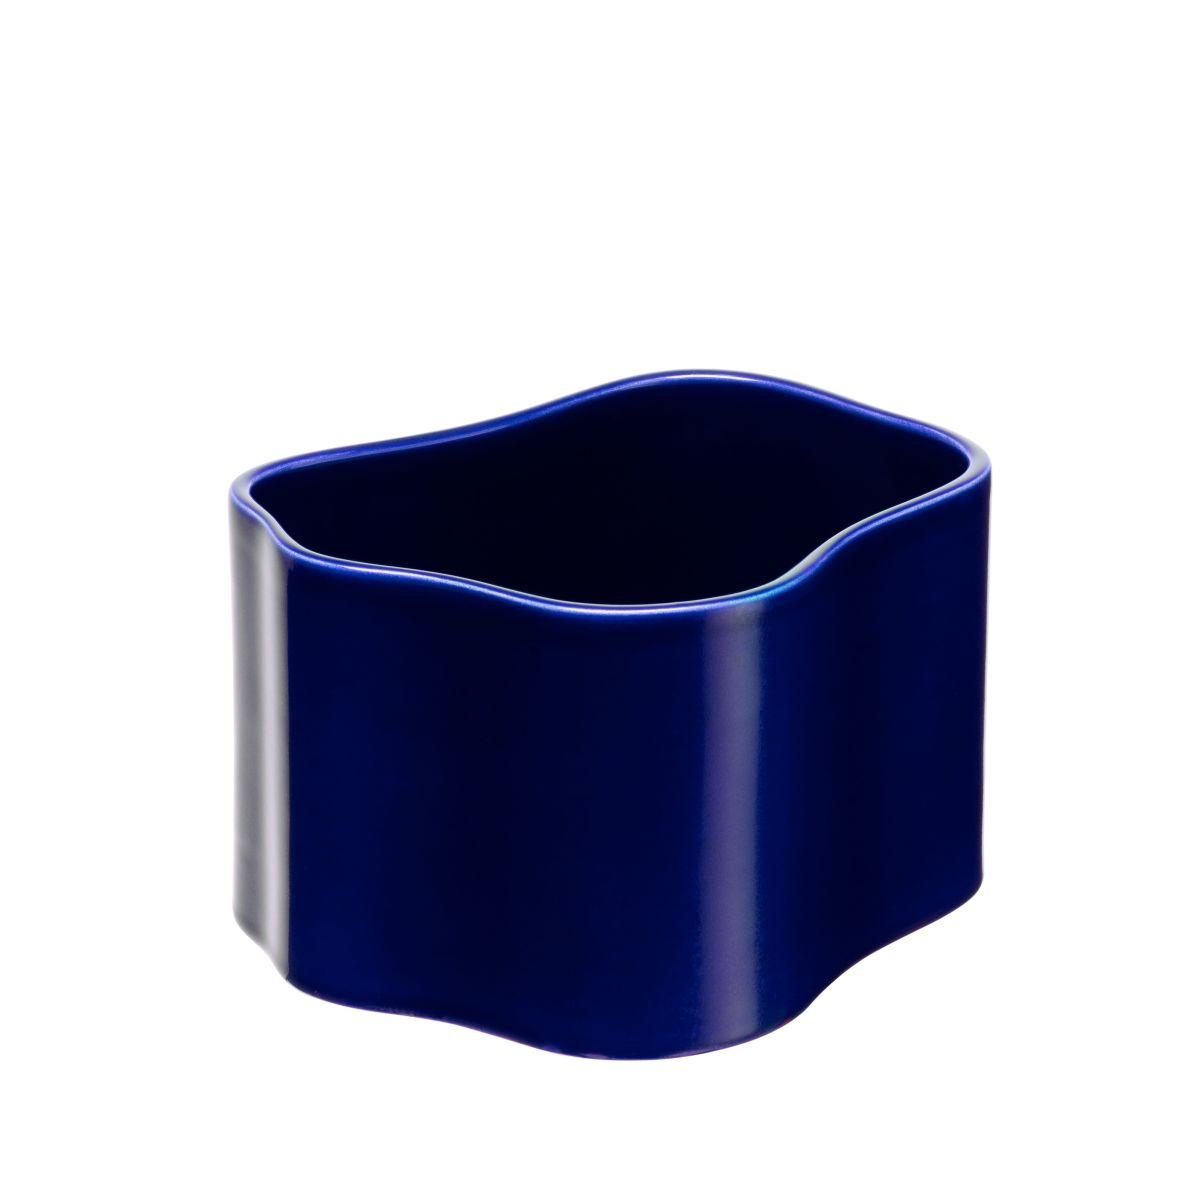 Plant-Pot-Shape-B-Size-S-Blue-Gloss_F